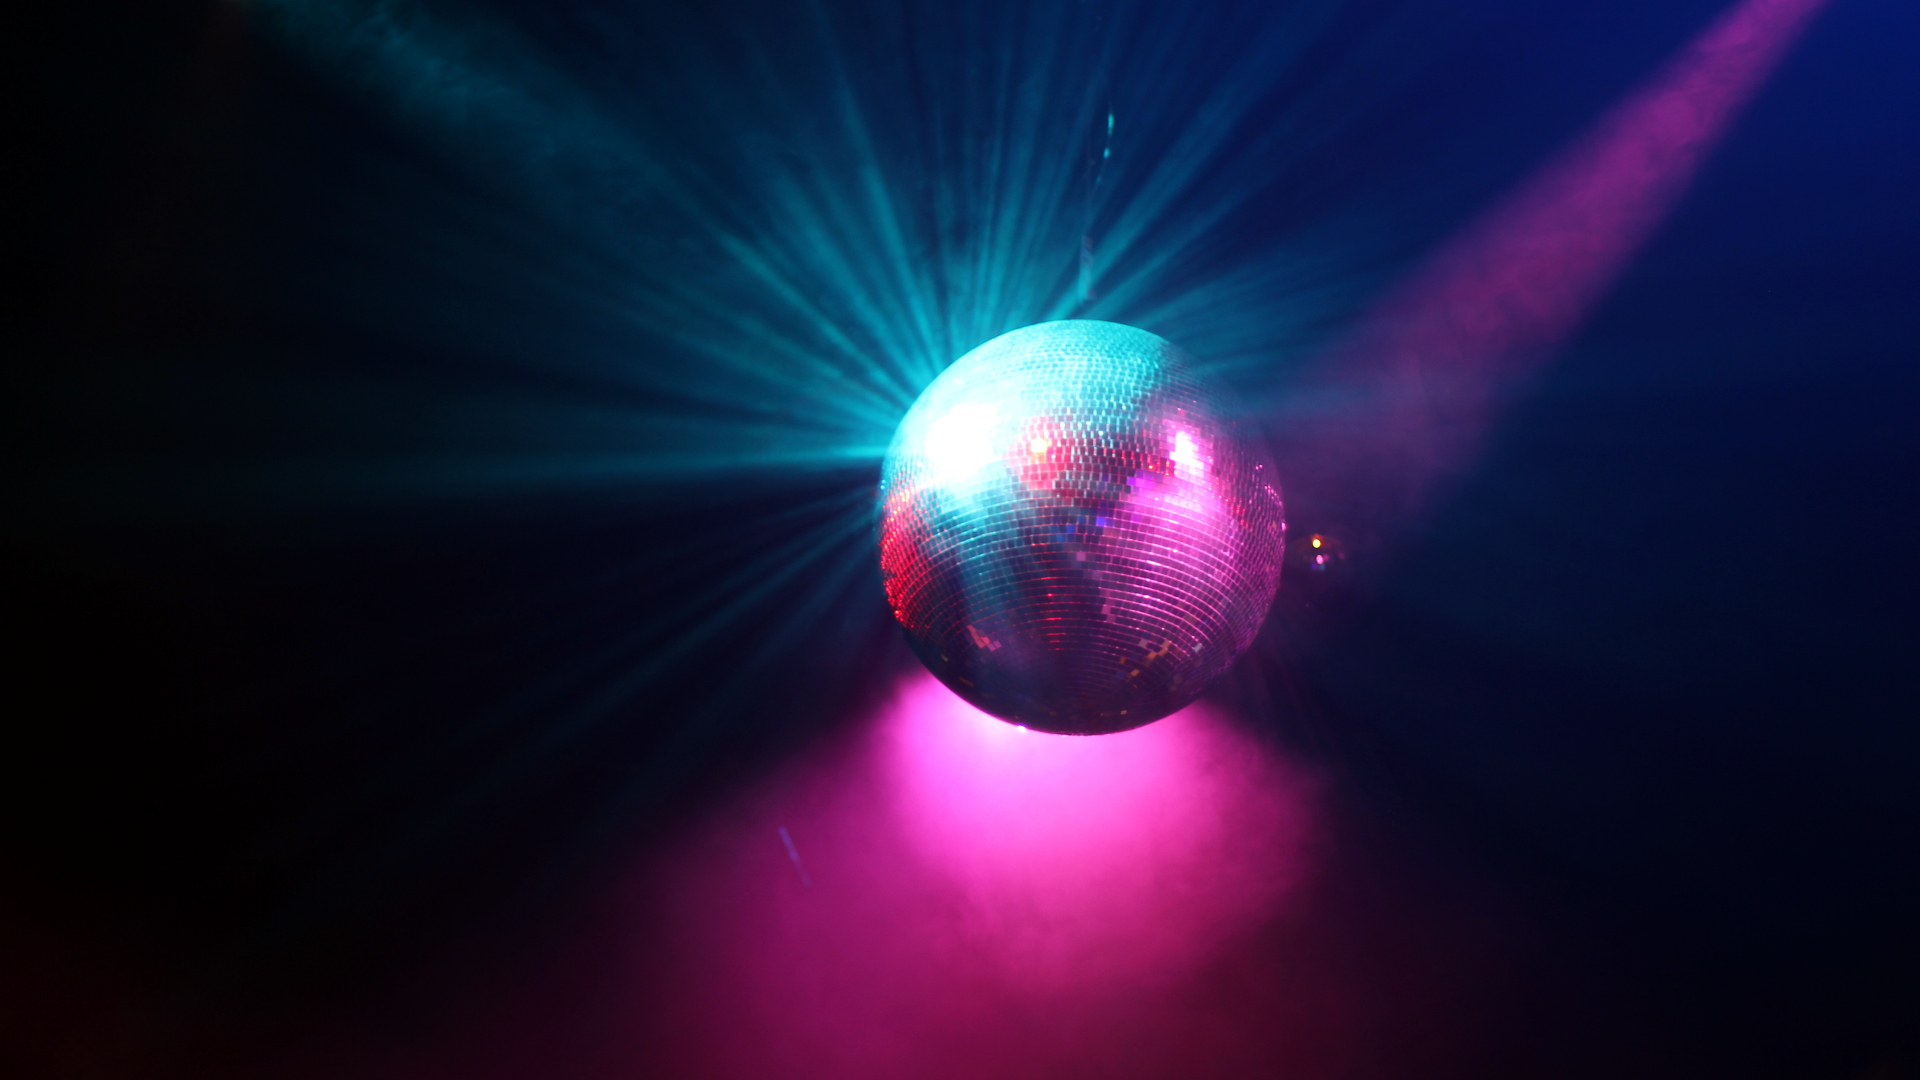 Blue Light Ball Room Cville